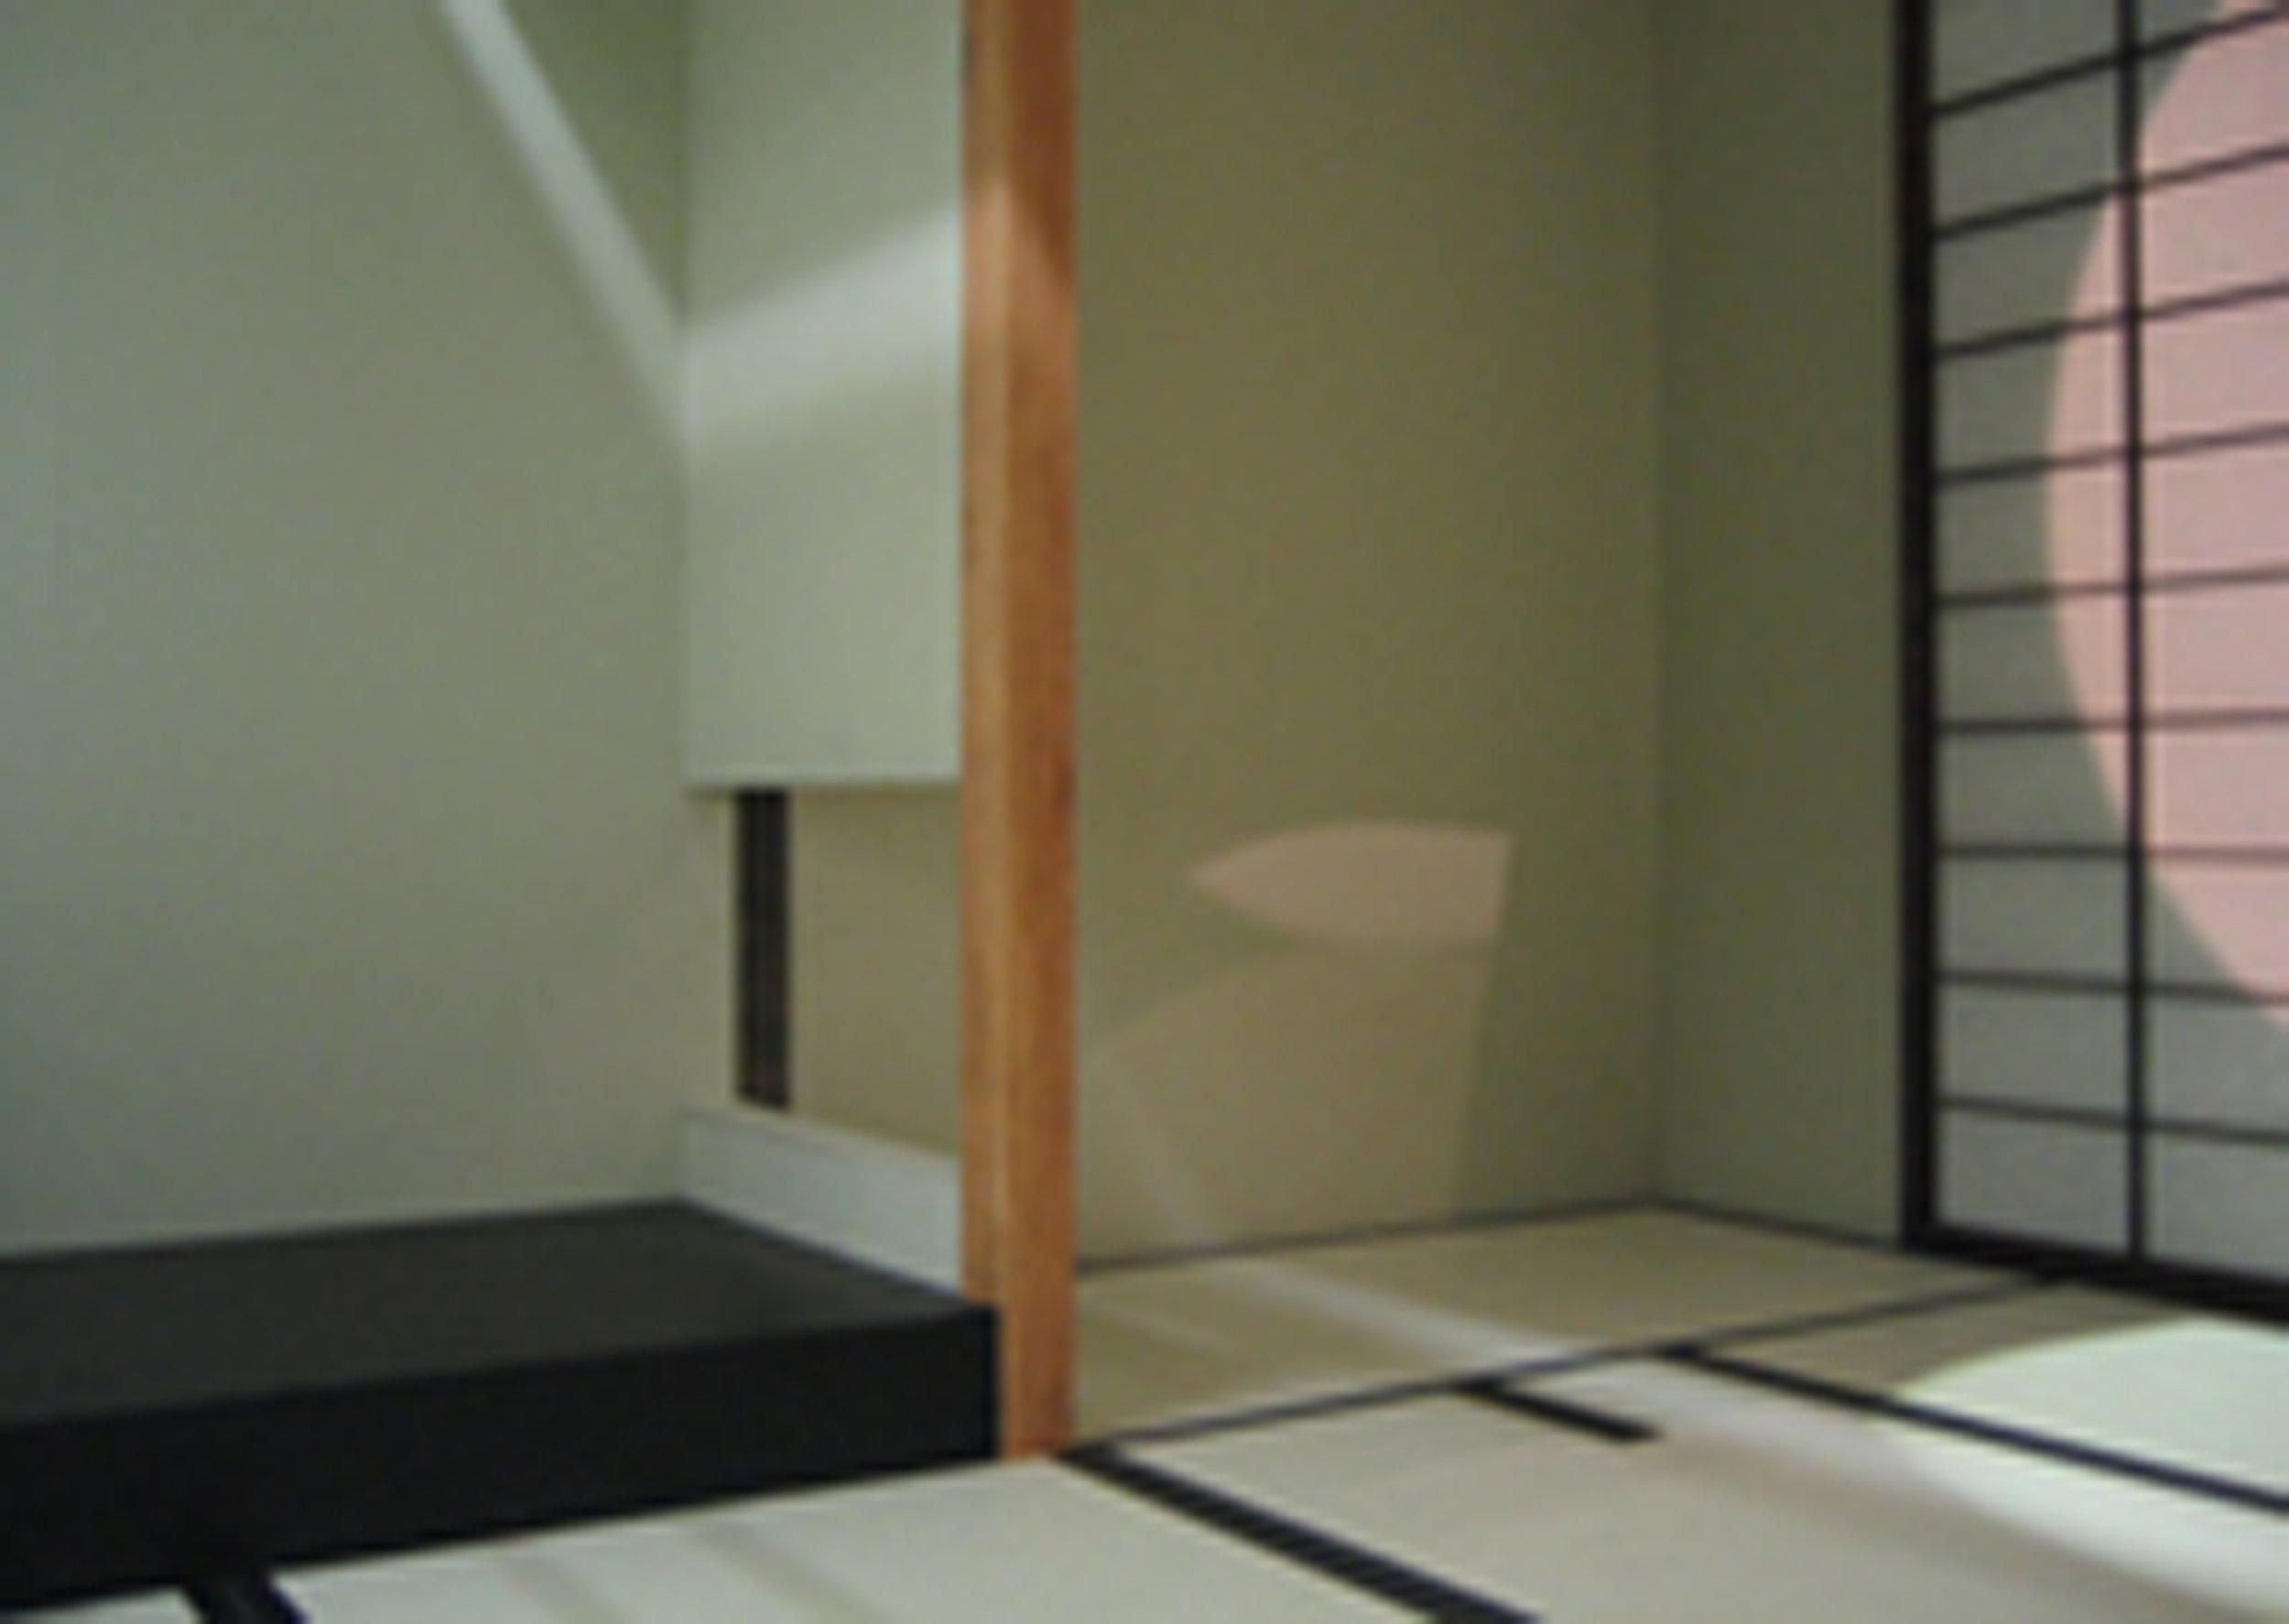 Japanese Teahouse 8 mat 2005 b b Gudrun Nielsen.jpg